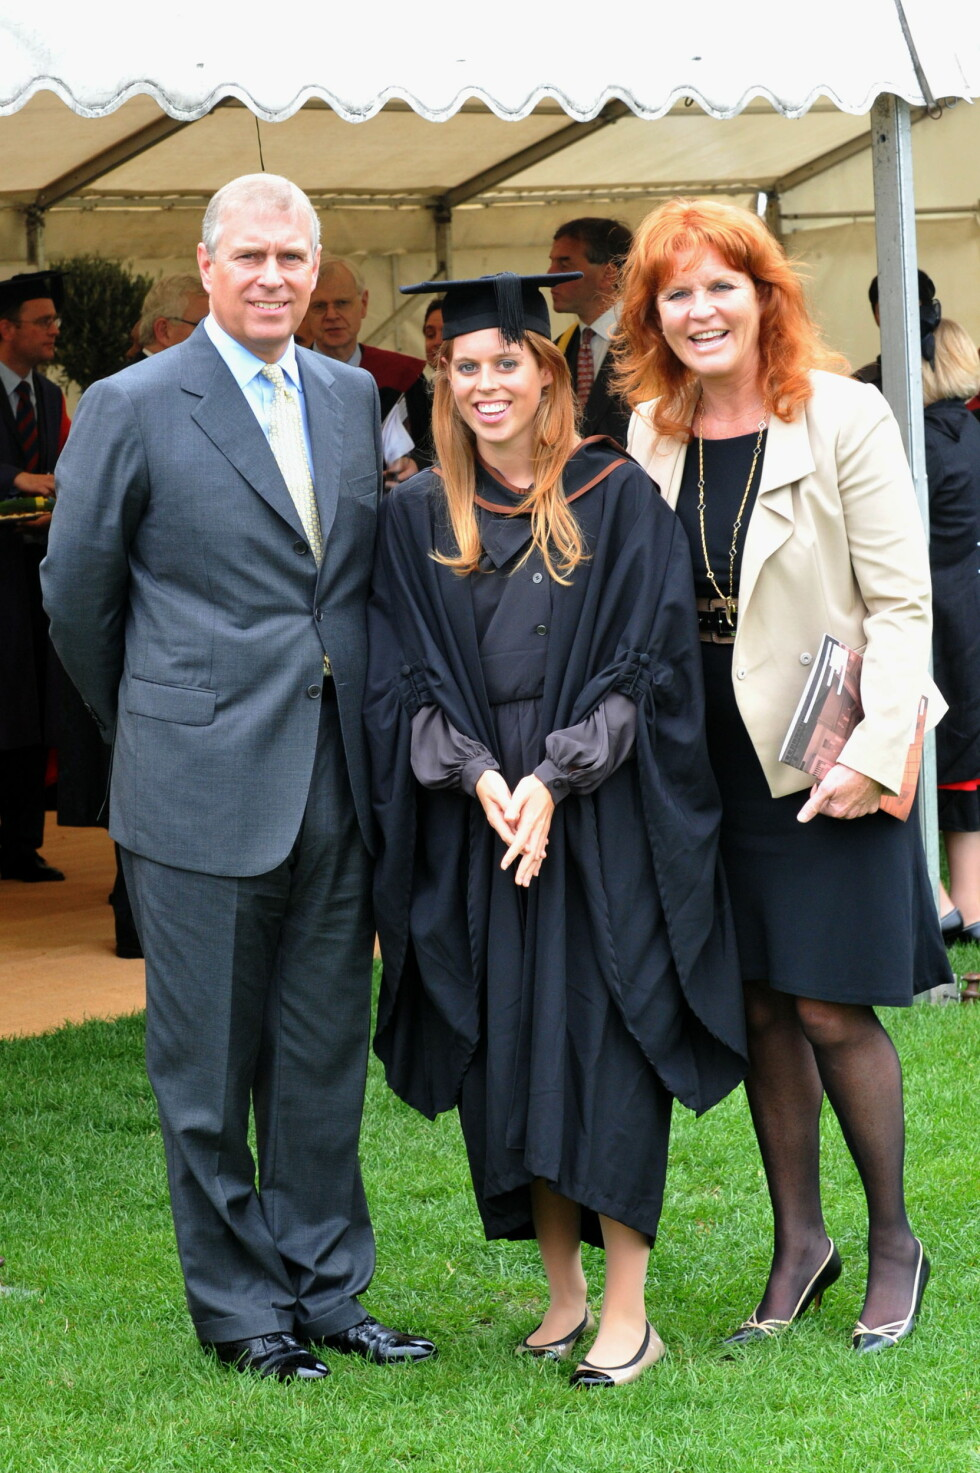 <strong>HARMONI:</strong> Stolte foreldre sammen med eldstedatteren Beatrice, da hun avsluttet sine studier ved  Goldsmiths College i 2011. Foto: Stella Pictures